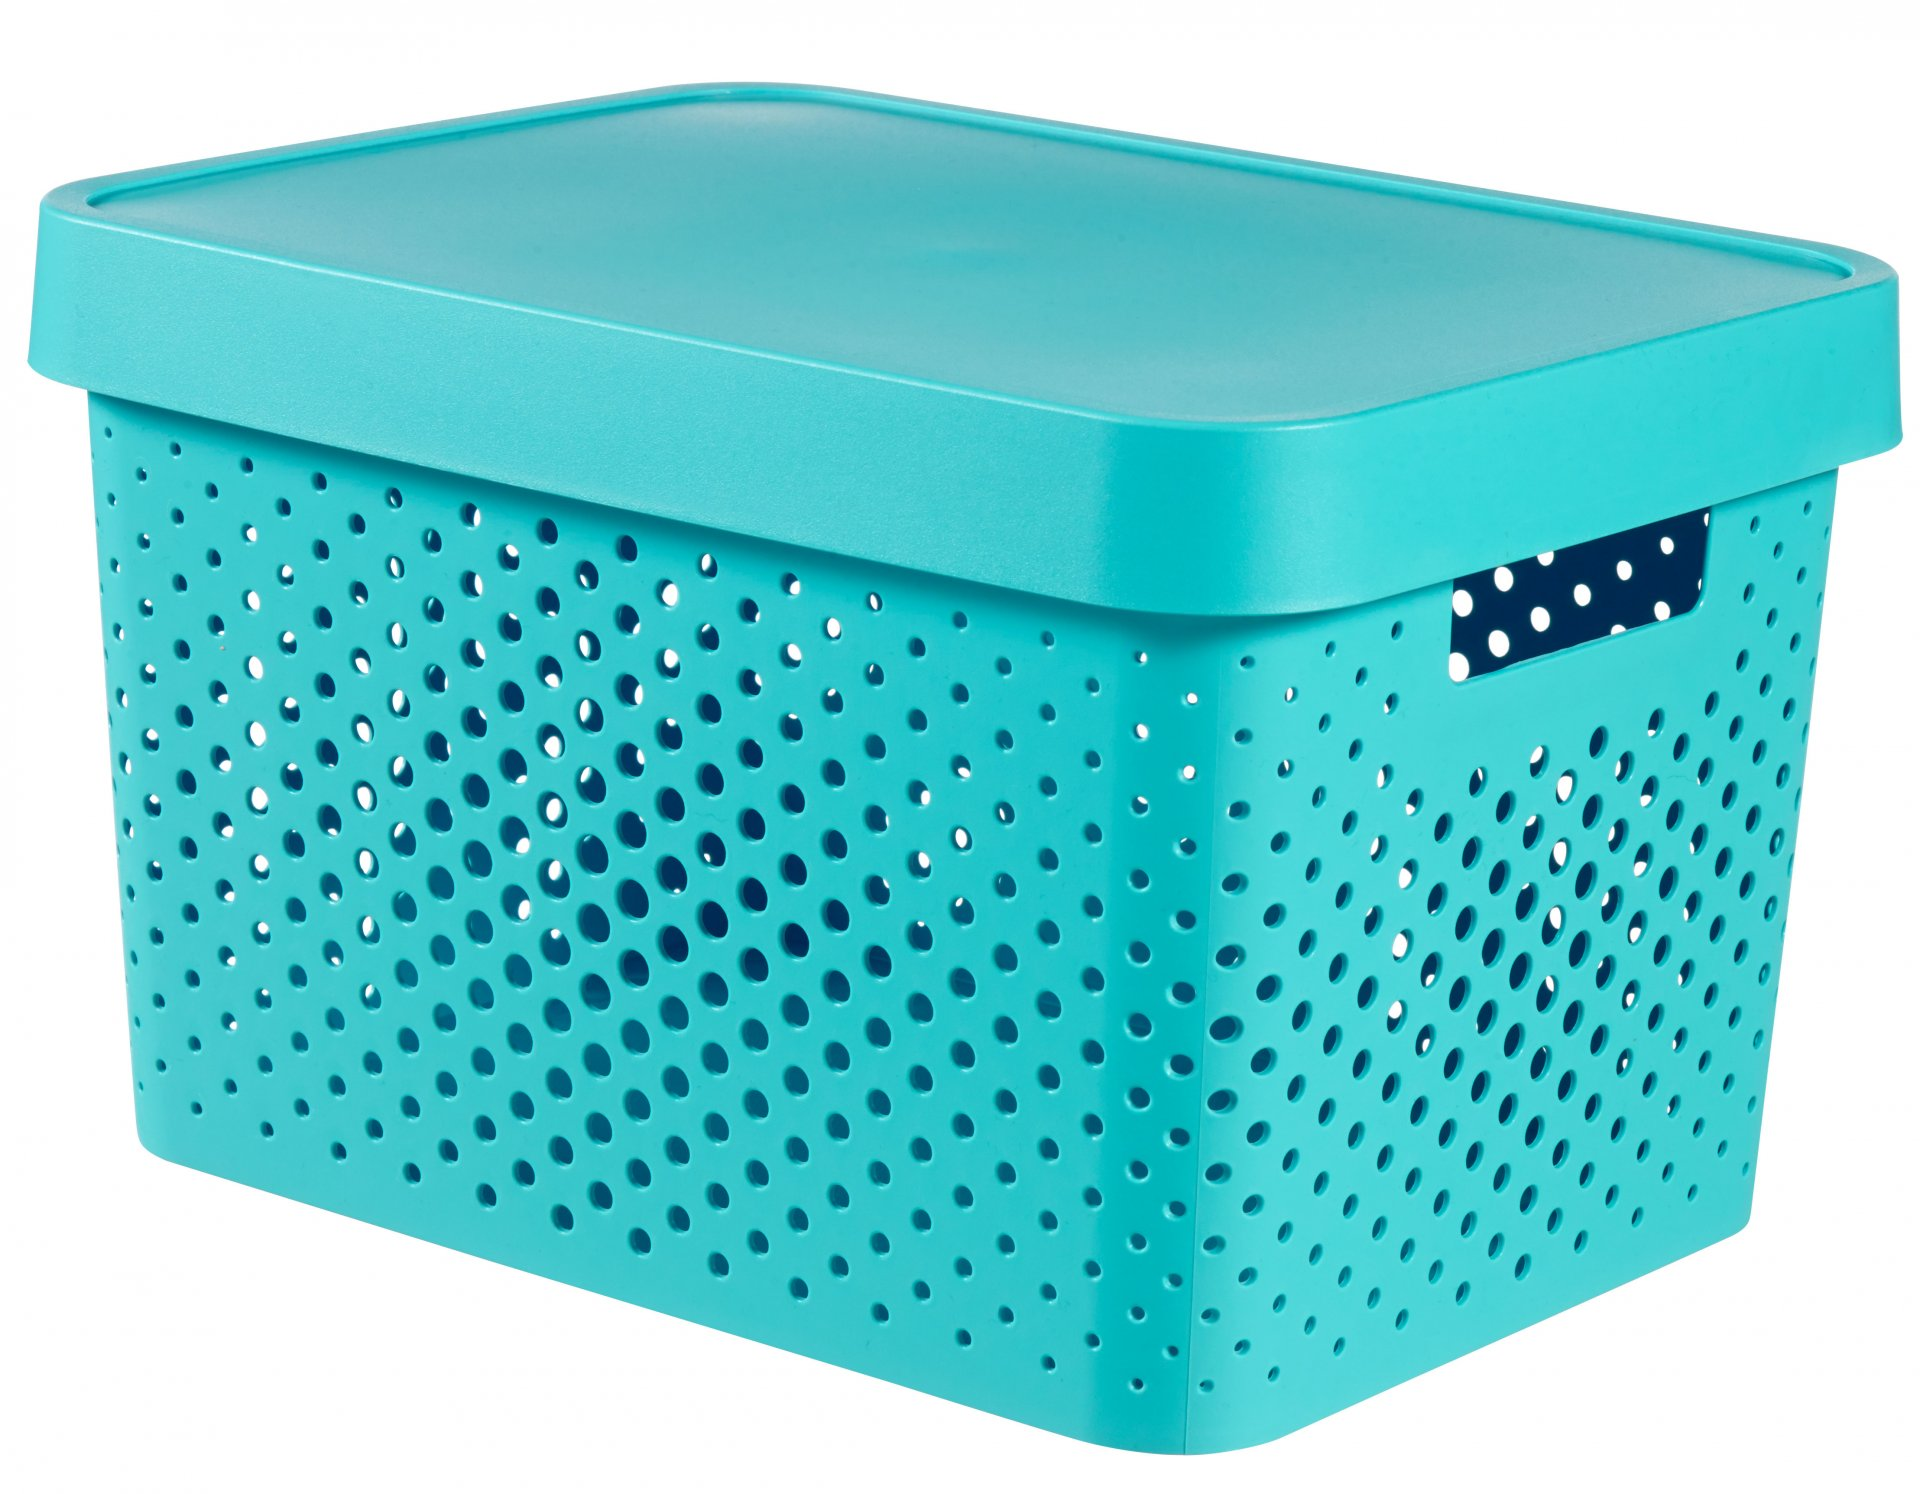 Curver Úložný box INFINITY 17l s víkem modrý puntíky